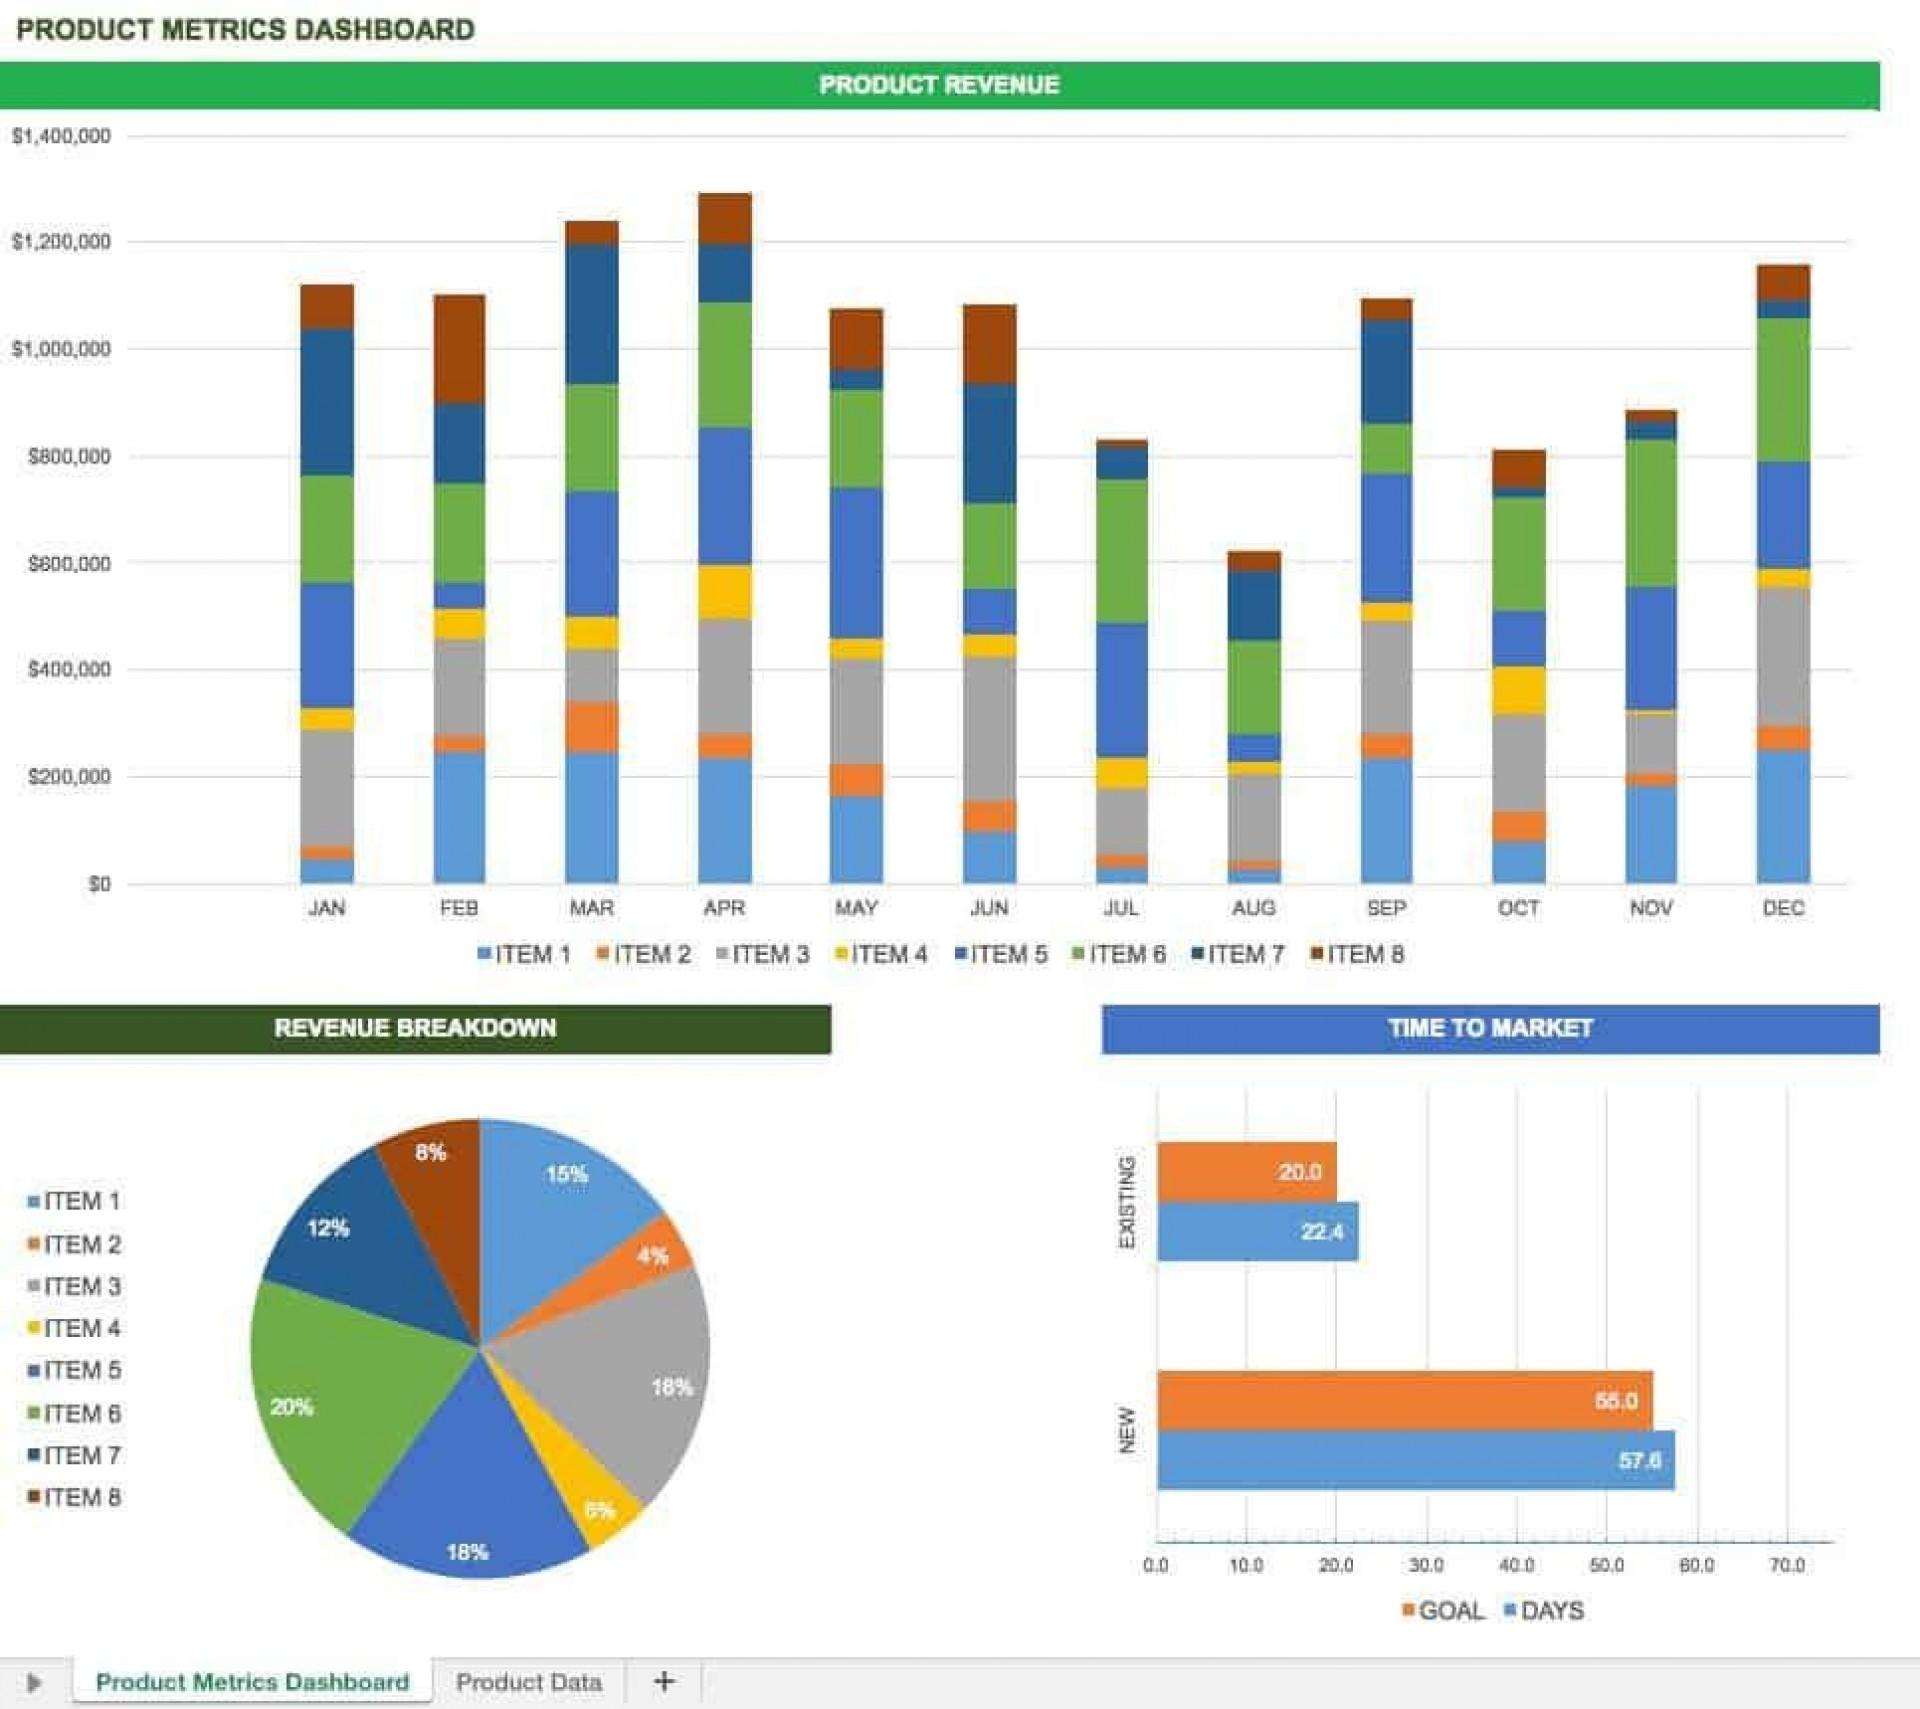 009 Wonderful Excel Dashboard Template Free Inspiration  Sale Logistic Kpi Download Procurement1920